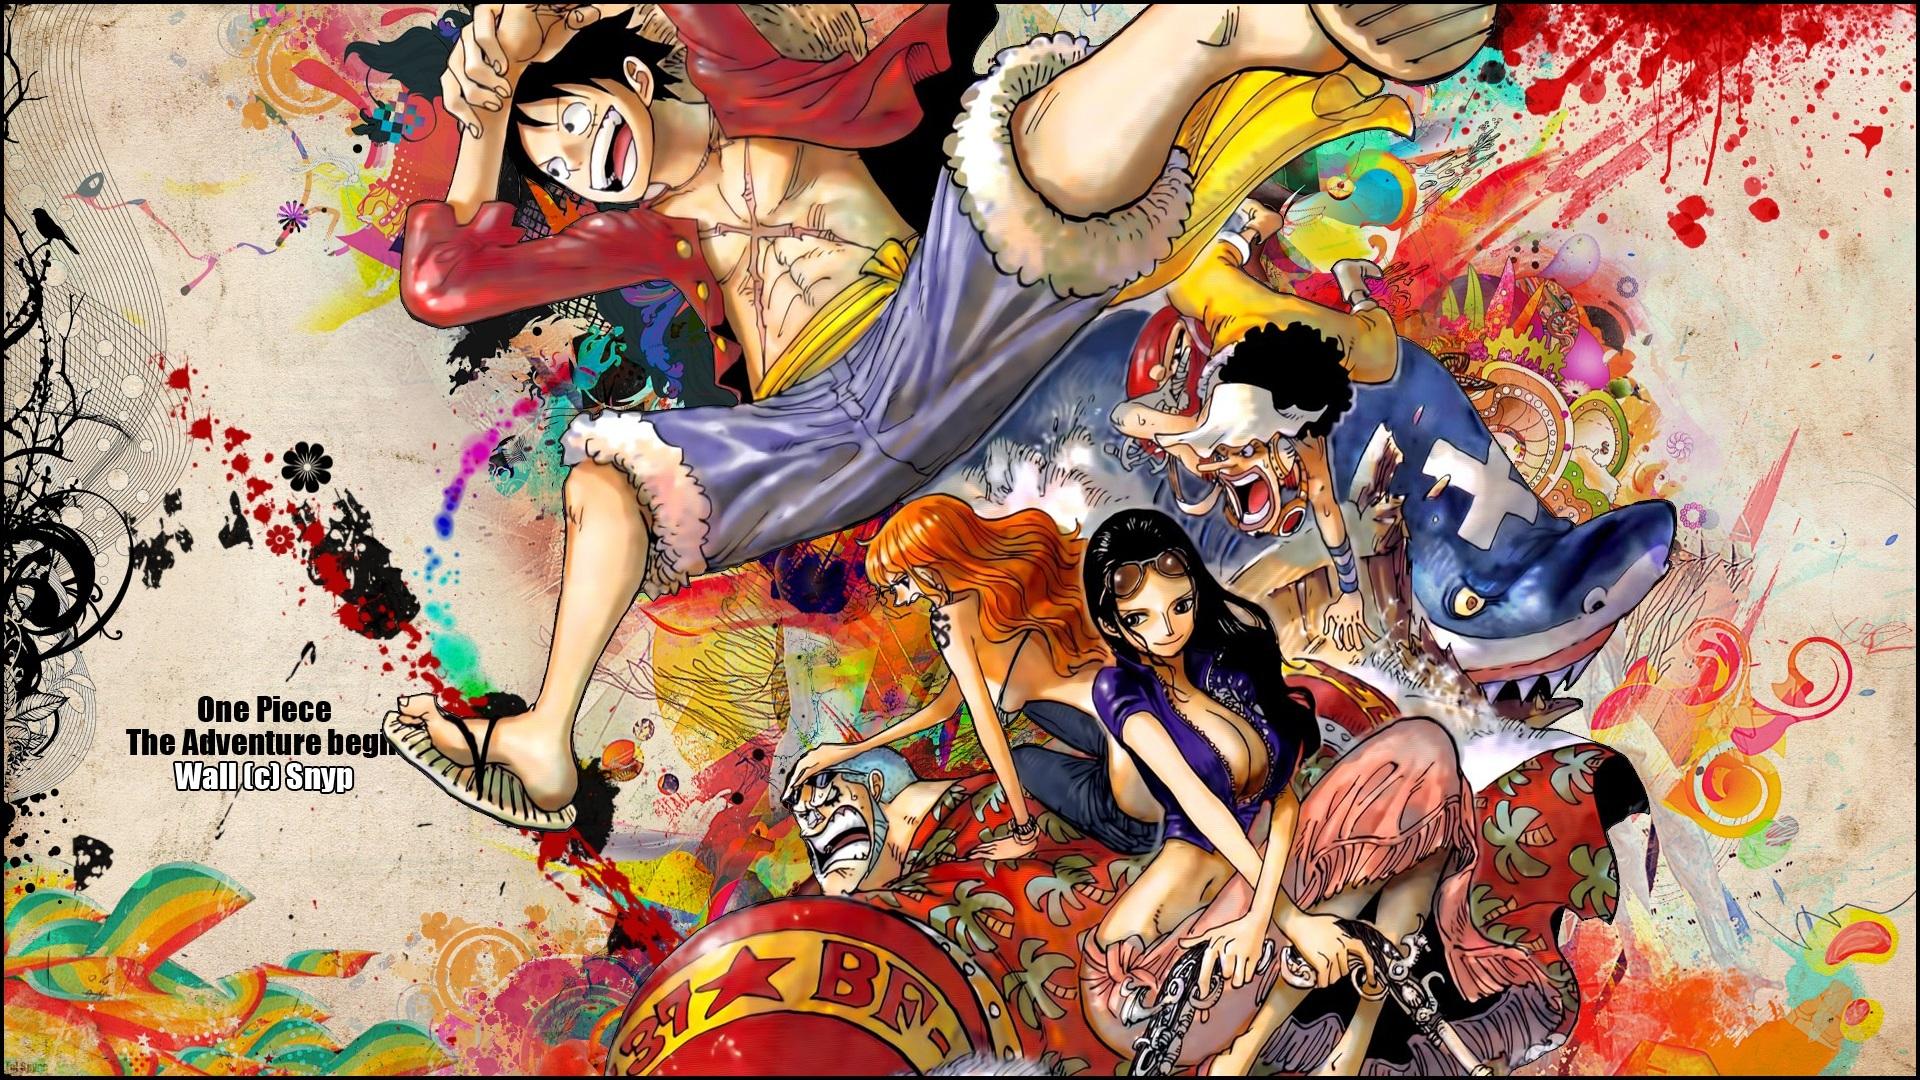 Free Download Fond Ecran Hd Manga One Piece Wallpaper Background 1920x1080 Picture 1920x1080 For Your Desktop Mobile Tablet Explore 76 One Piece Wallpaper Hd One Piece Wallpaper 1920x1080 Cool